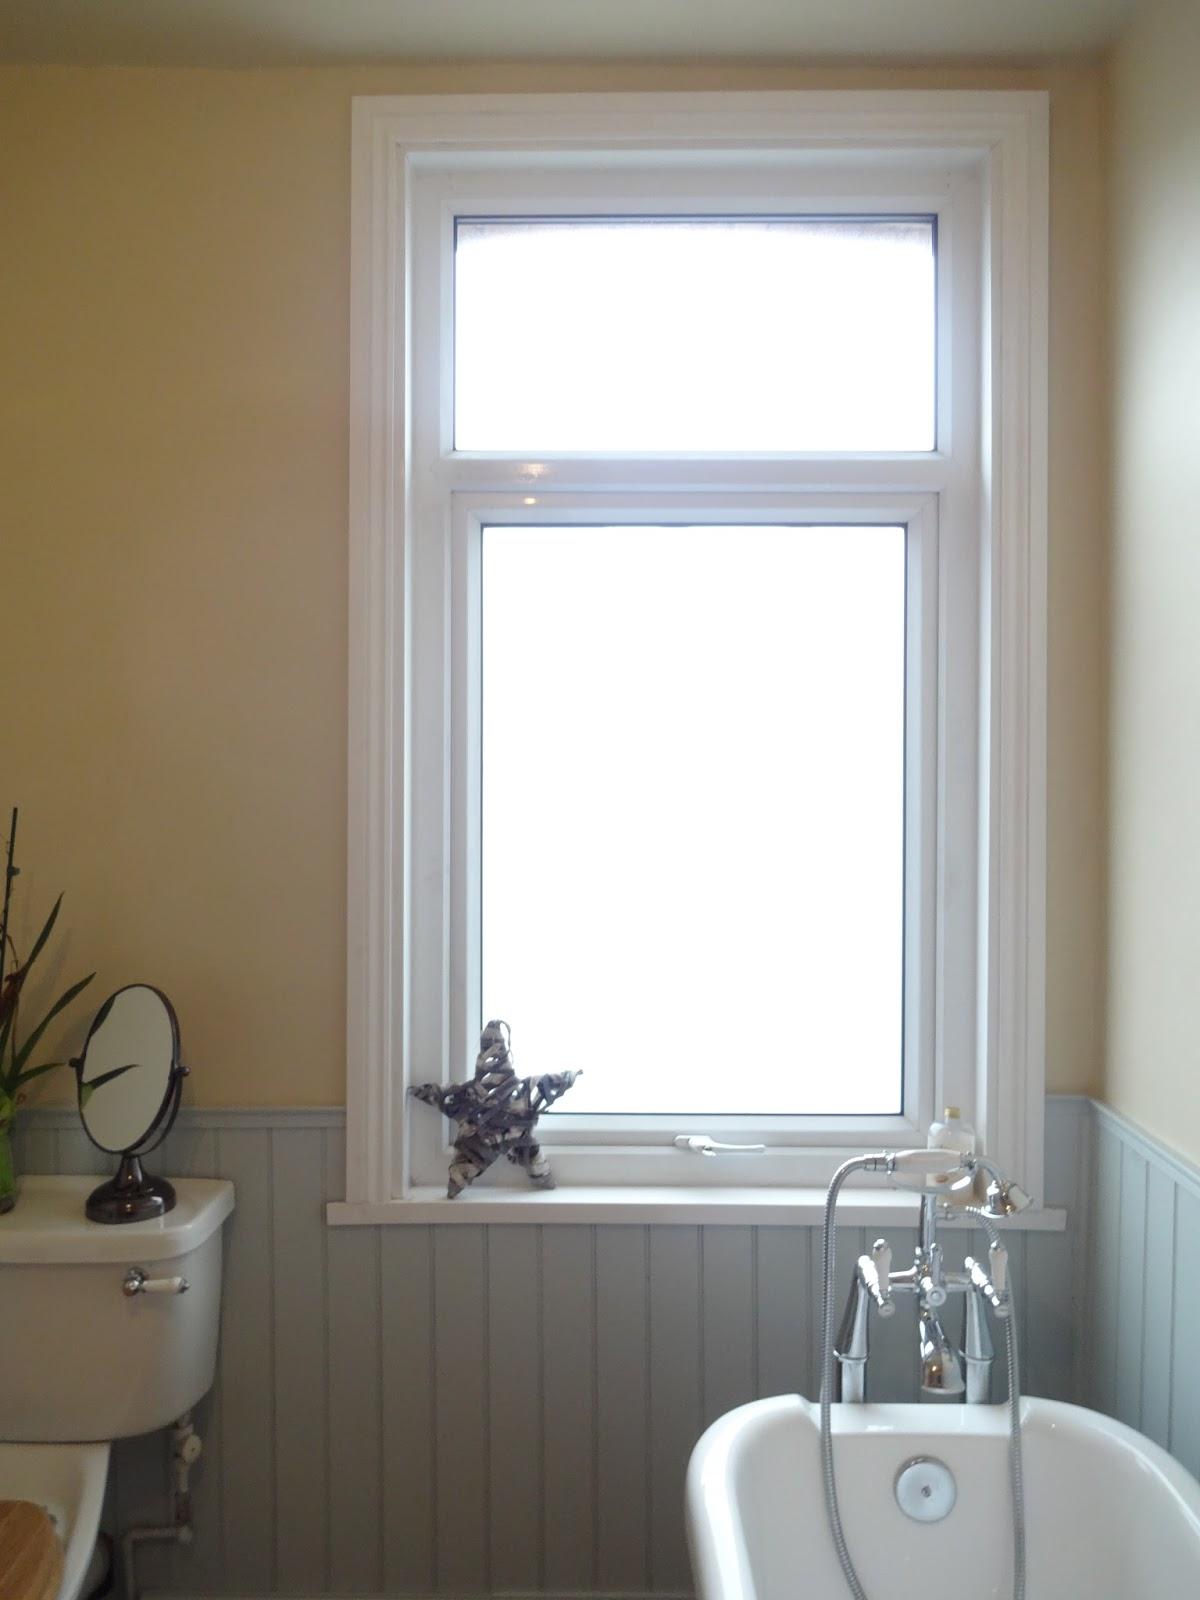 Kezzabeth.co.uk | UK Home Renovation, Interiors and DIY Blog